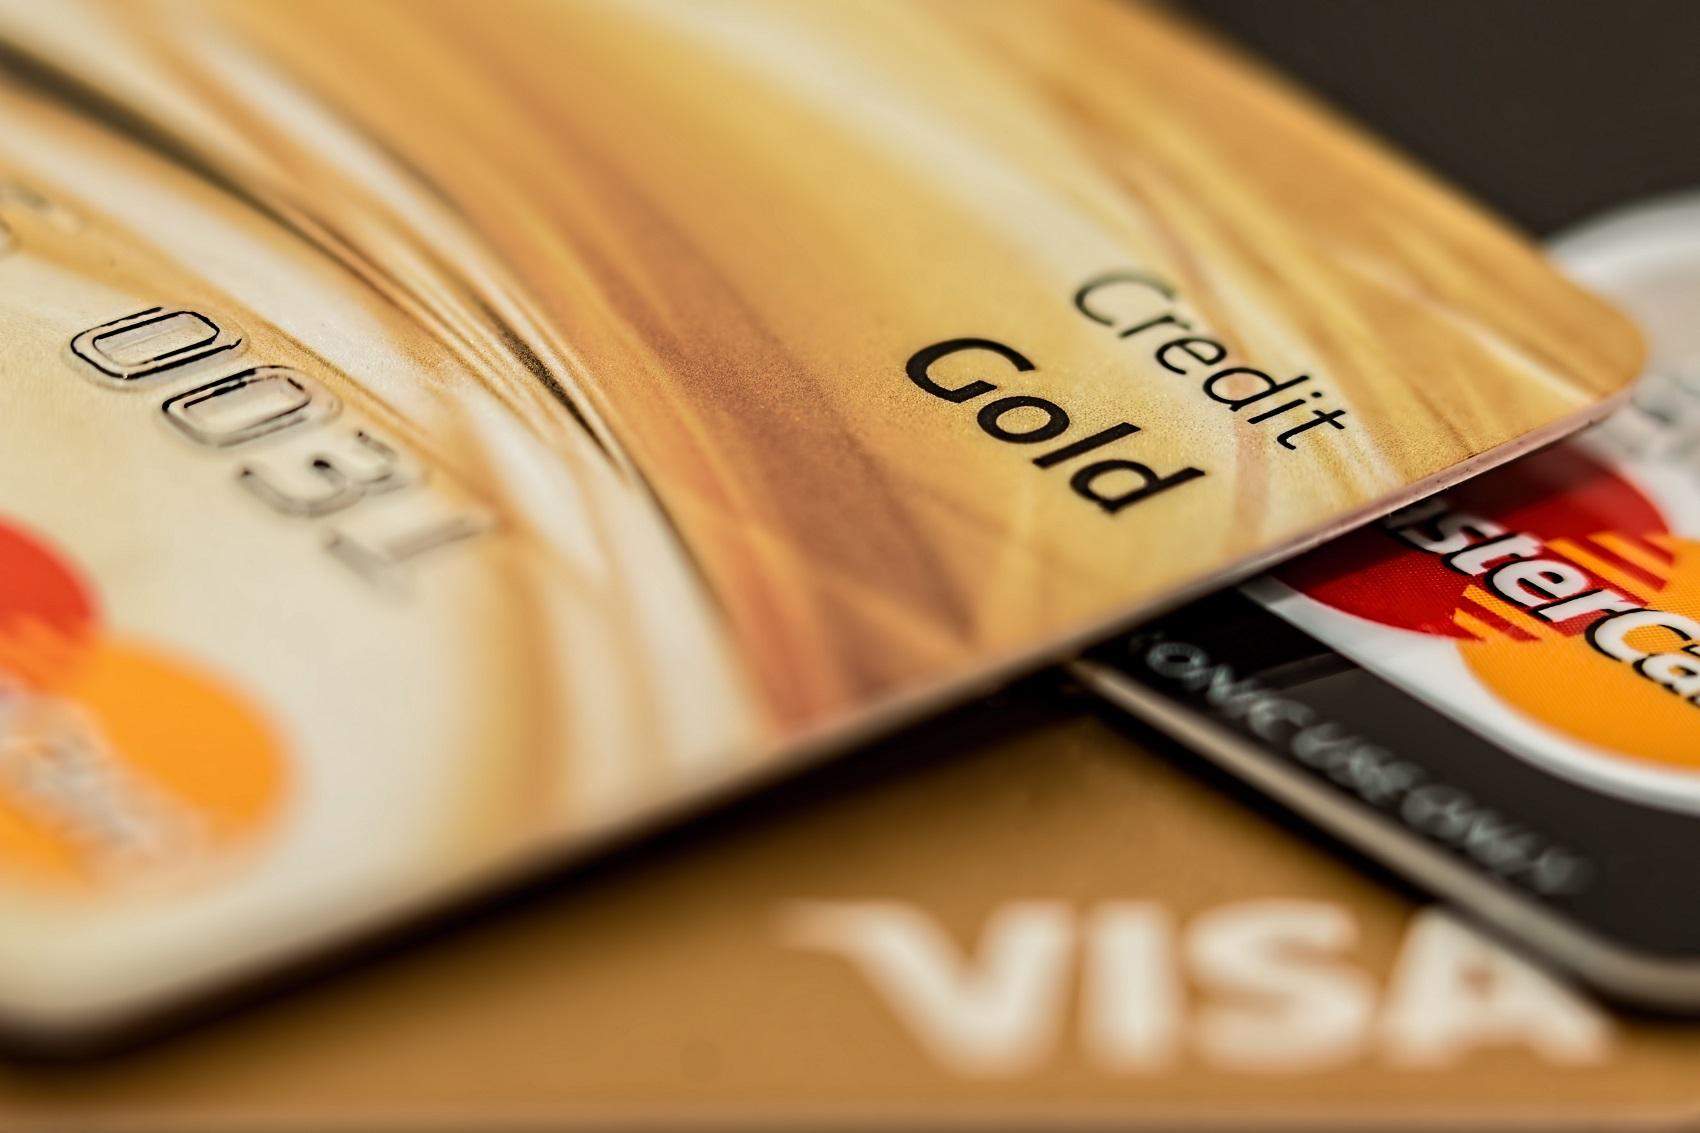 Evaluation of banking customer segmentation in India